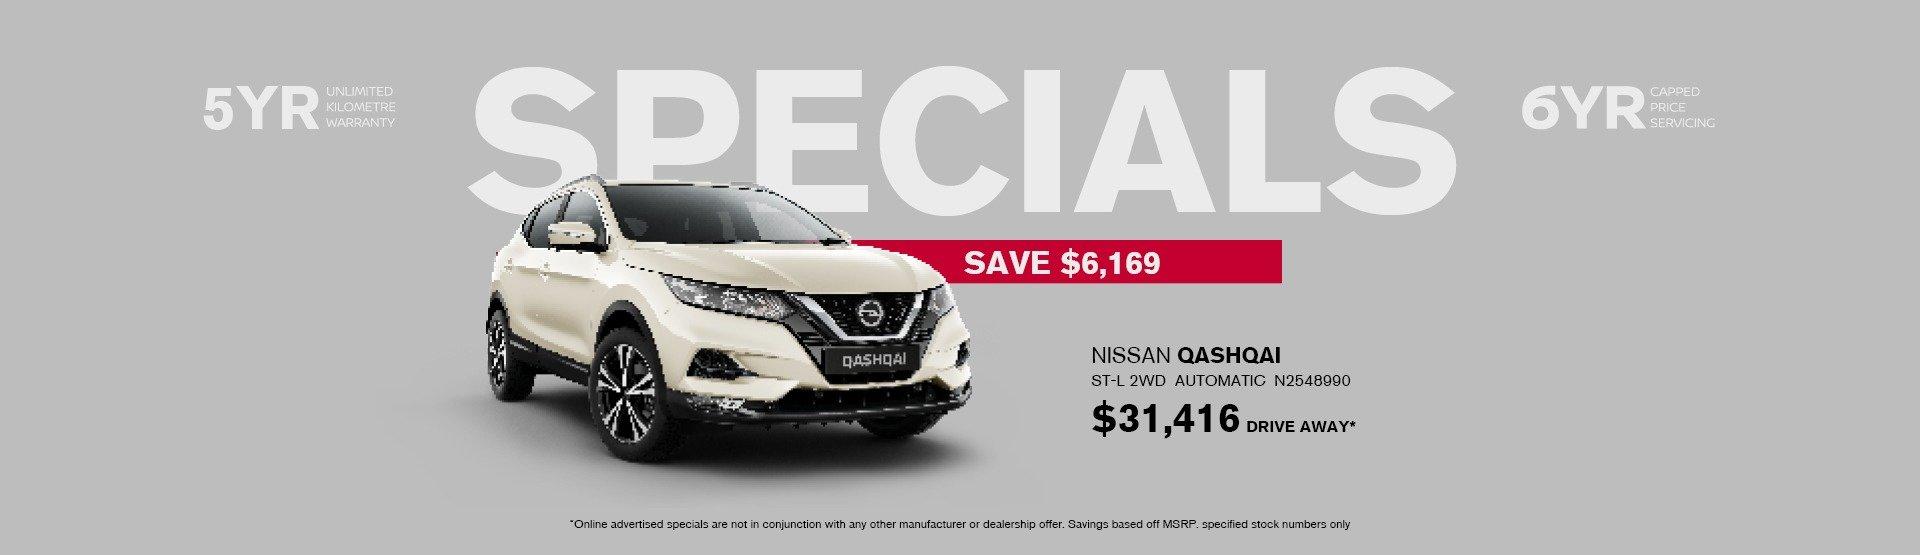 Maitland Nissan Plate Clearance Deals